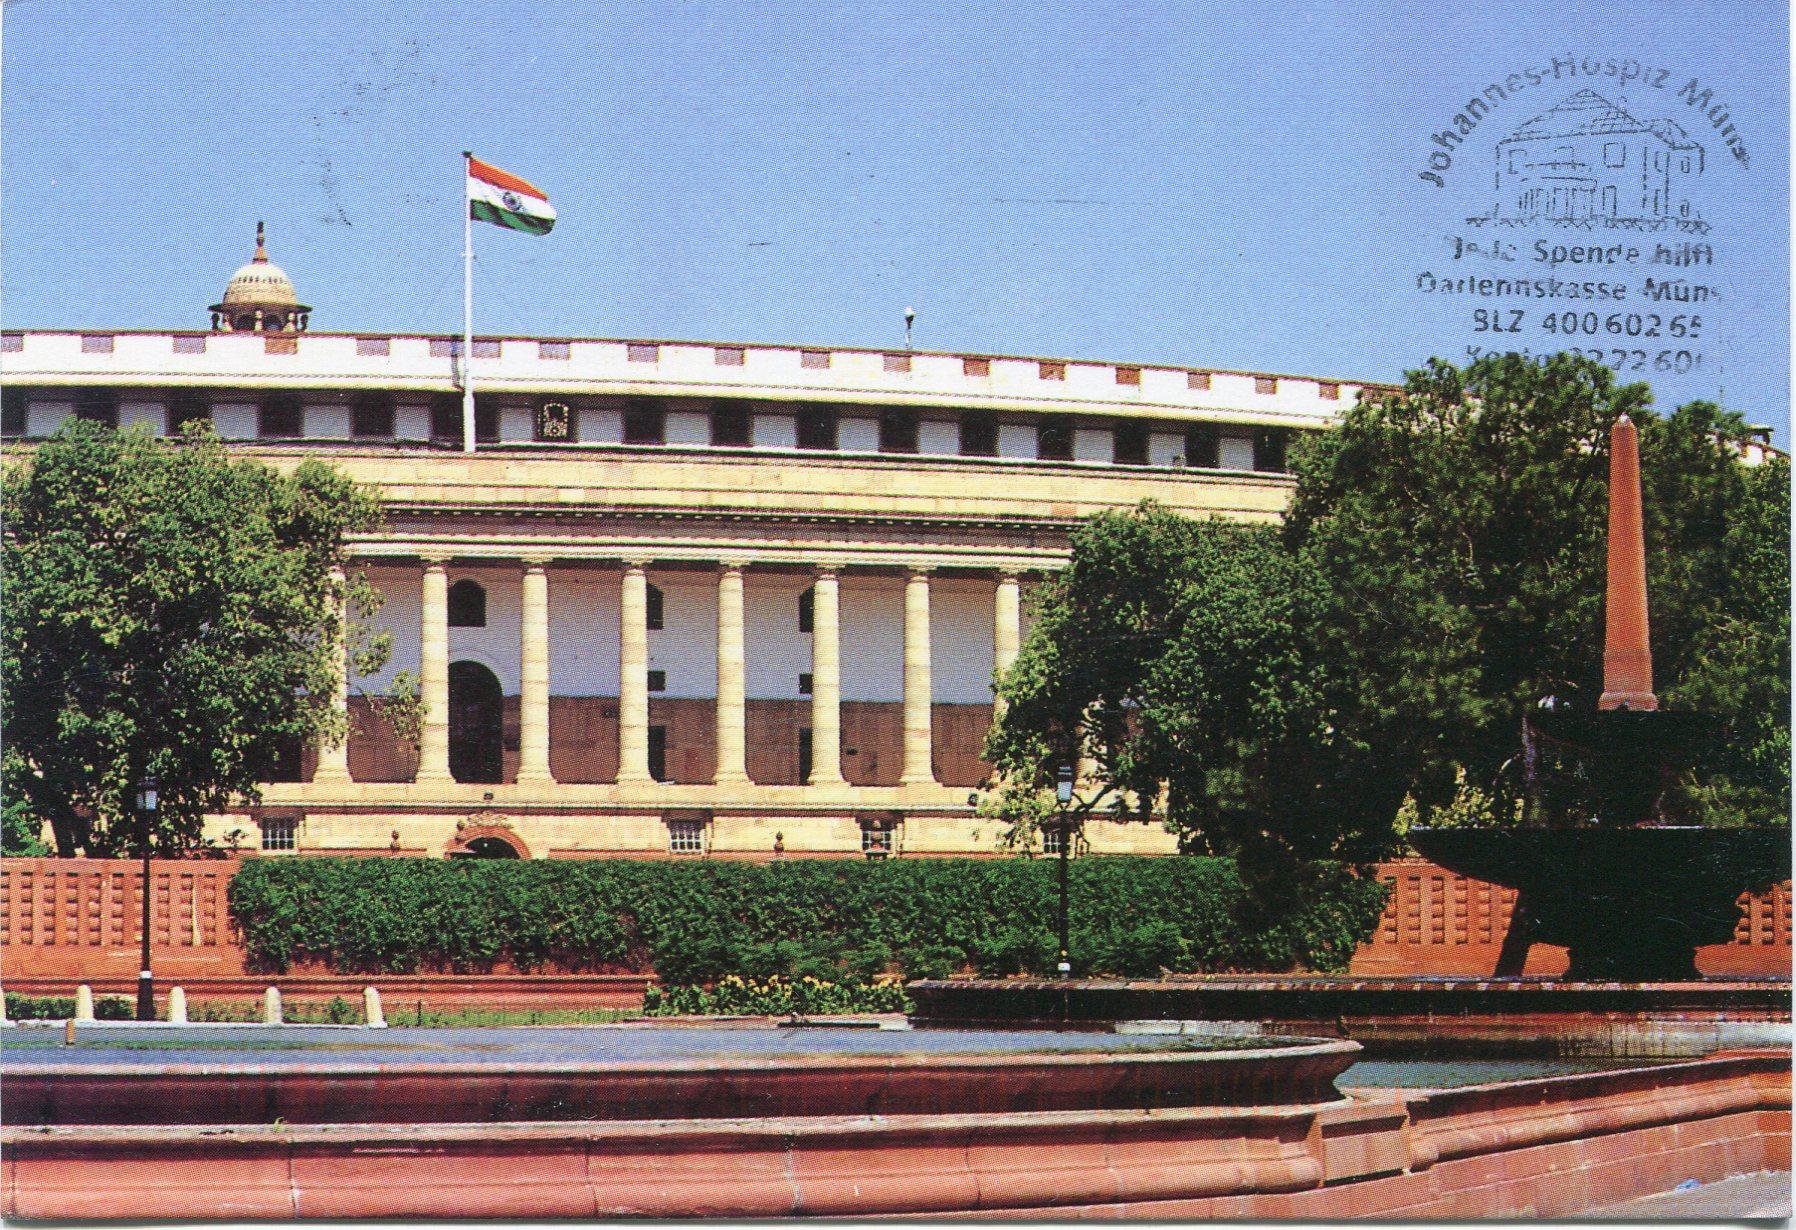 parliament house sansad bhawan the indian parliament building is a ...